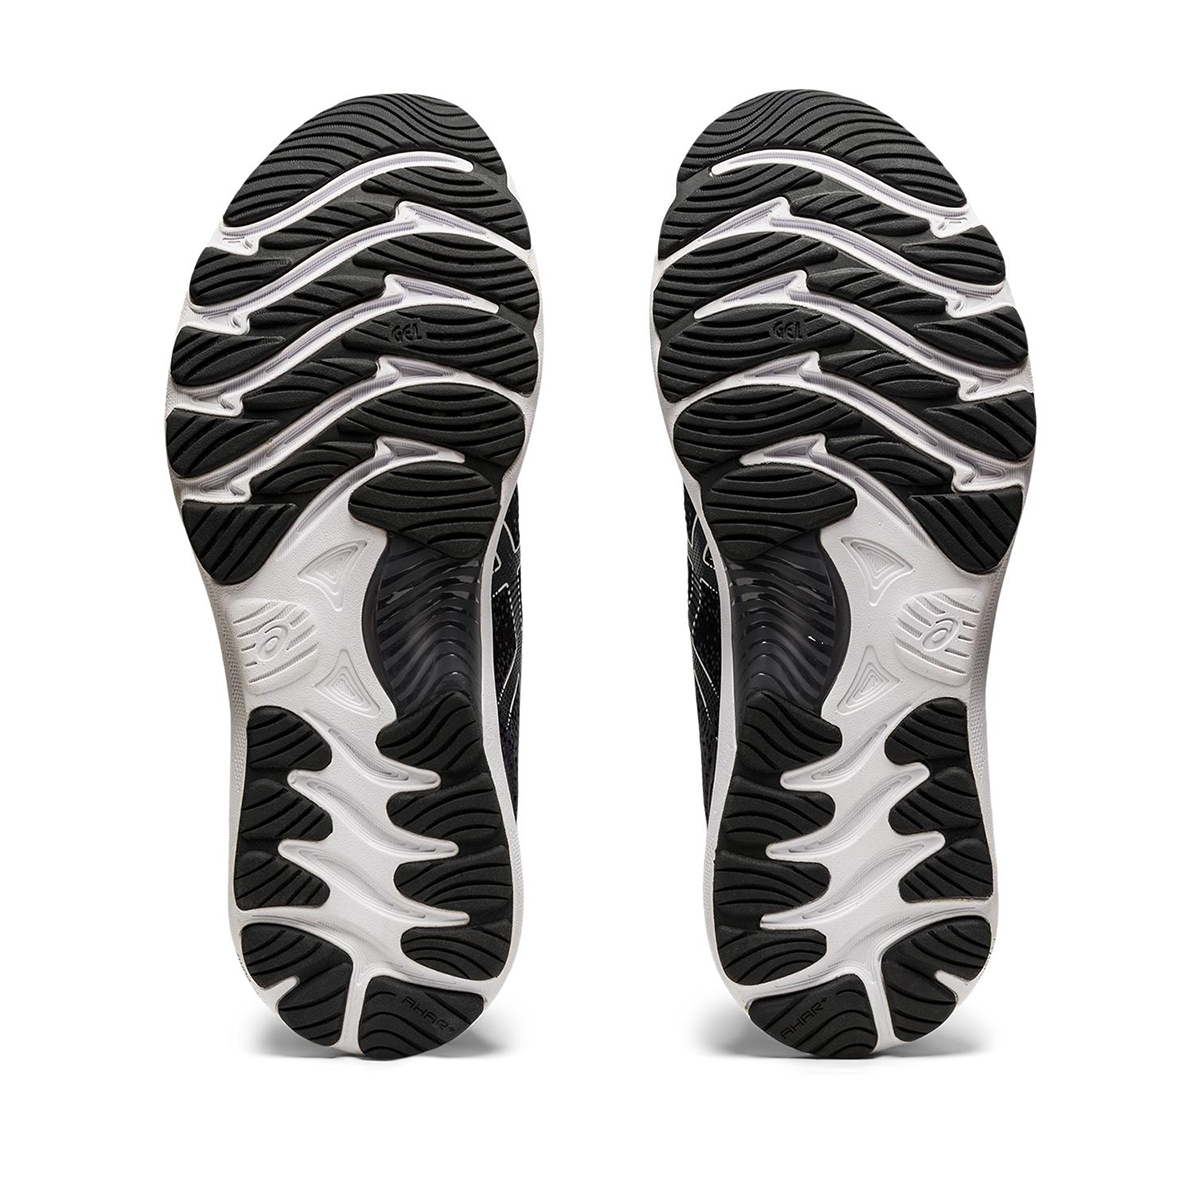 Men's Asics GEL-Nimbus 23 Running Shoe - Color: Black/White - Size: 7 - Width: Regular, Black/White, large, image 6